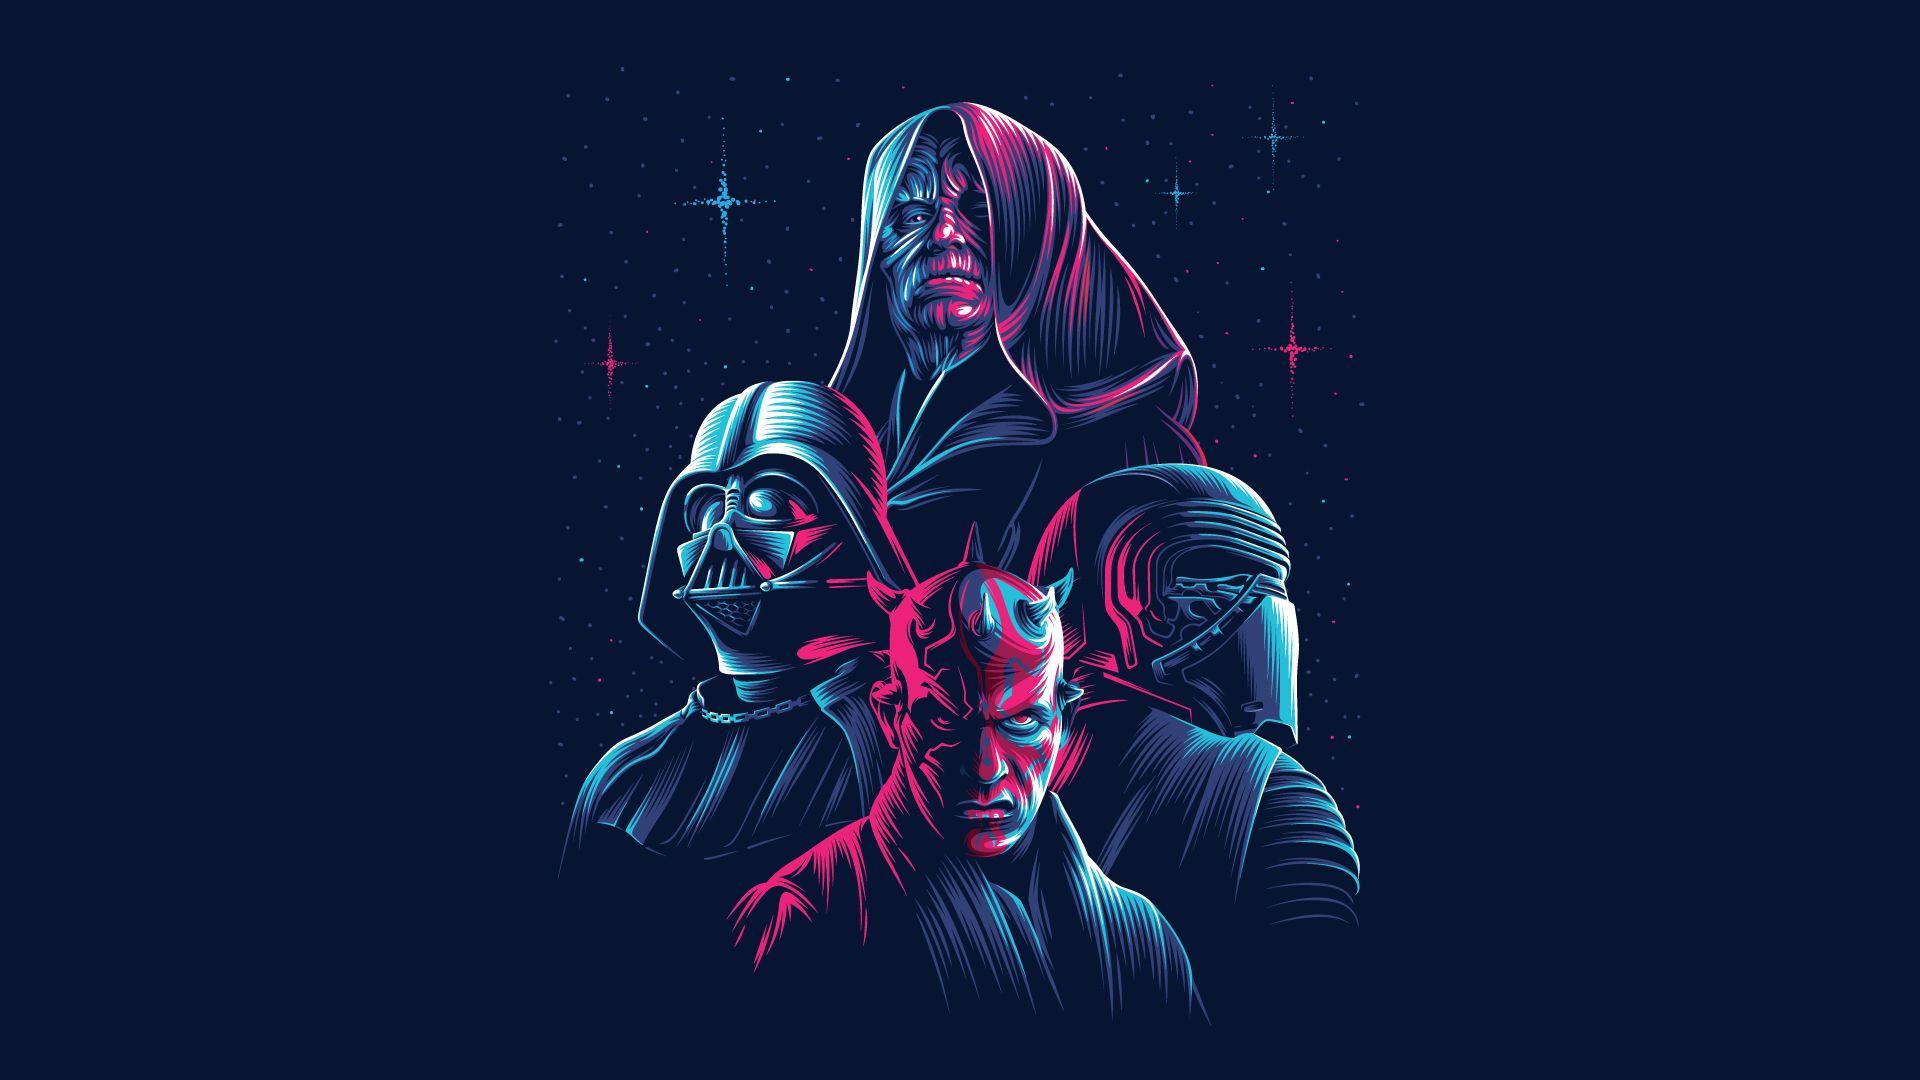 Star Wars Dark Side 1920x1080 Full Credits To U Theamitytyr Star Wars Background Star Wars Wallpaper Dark Side Star Wars